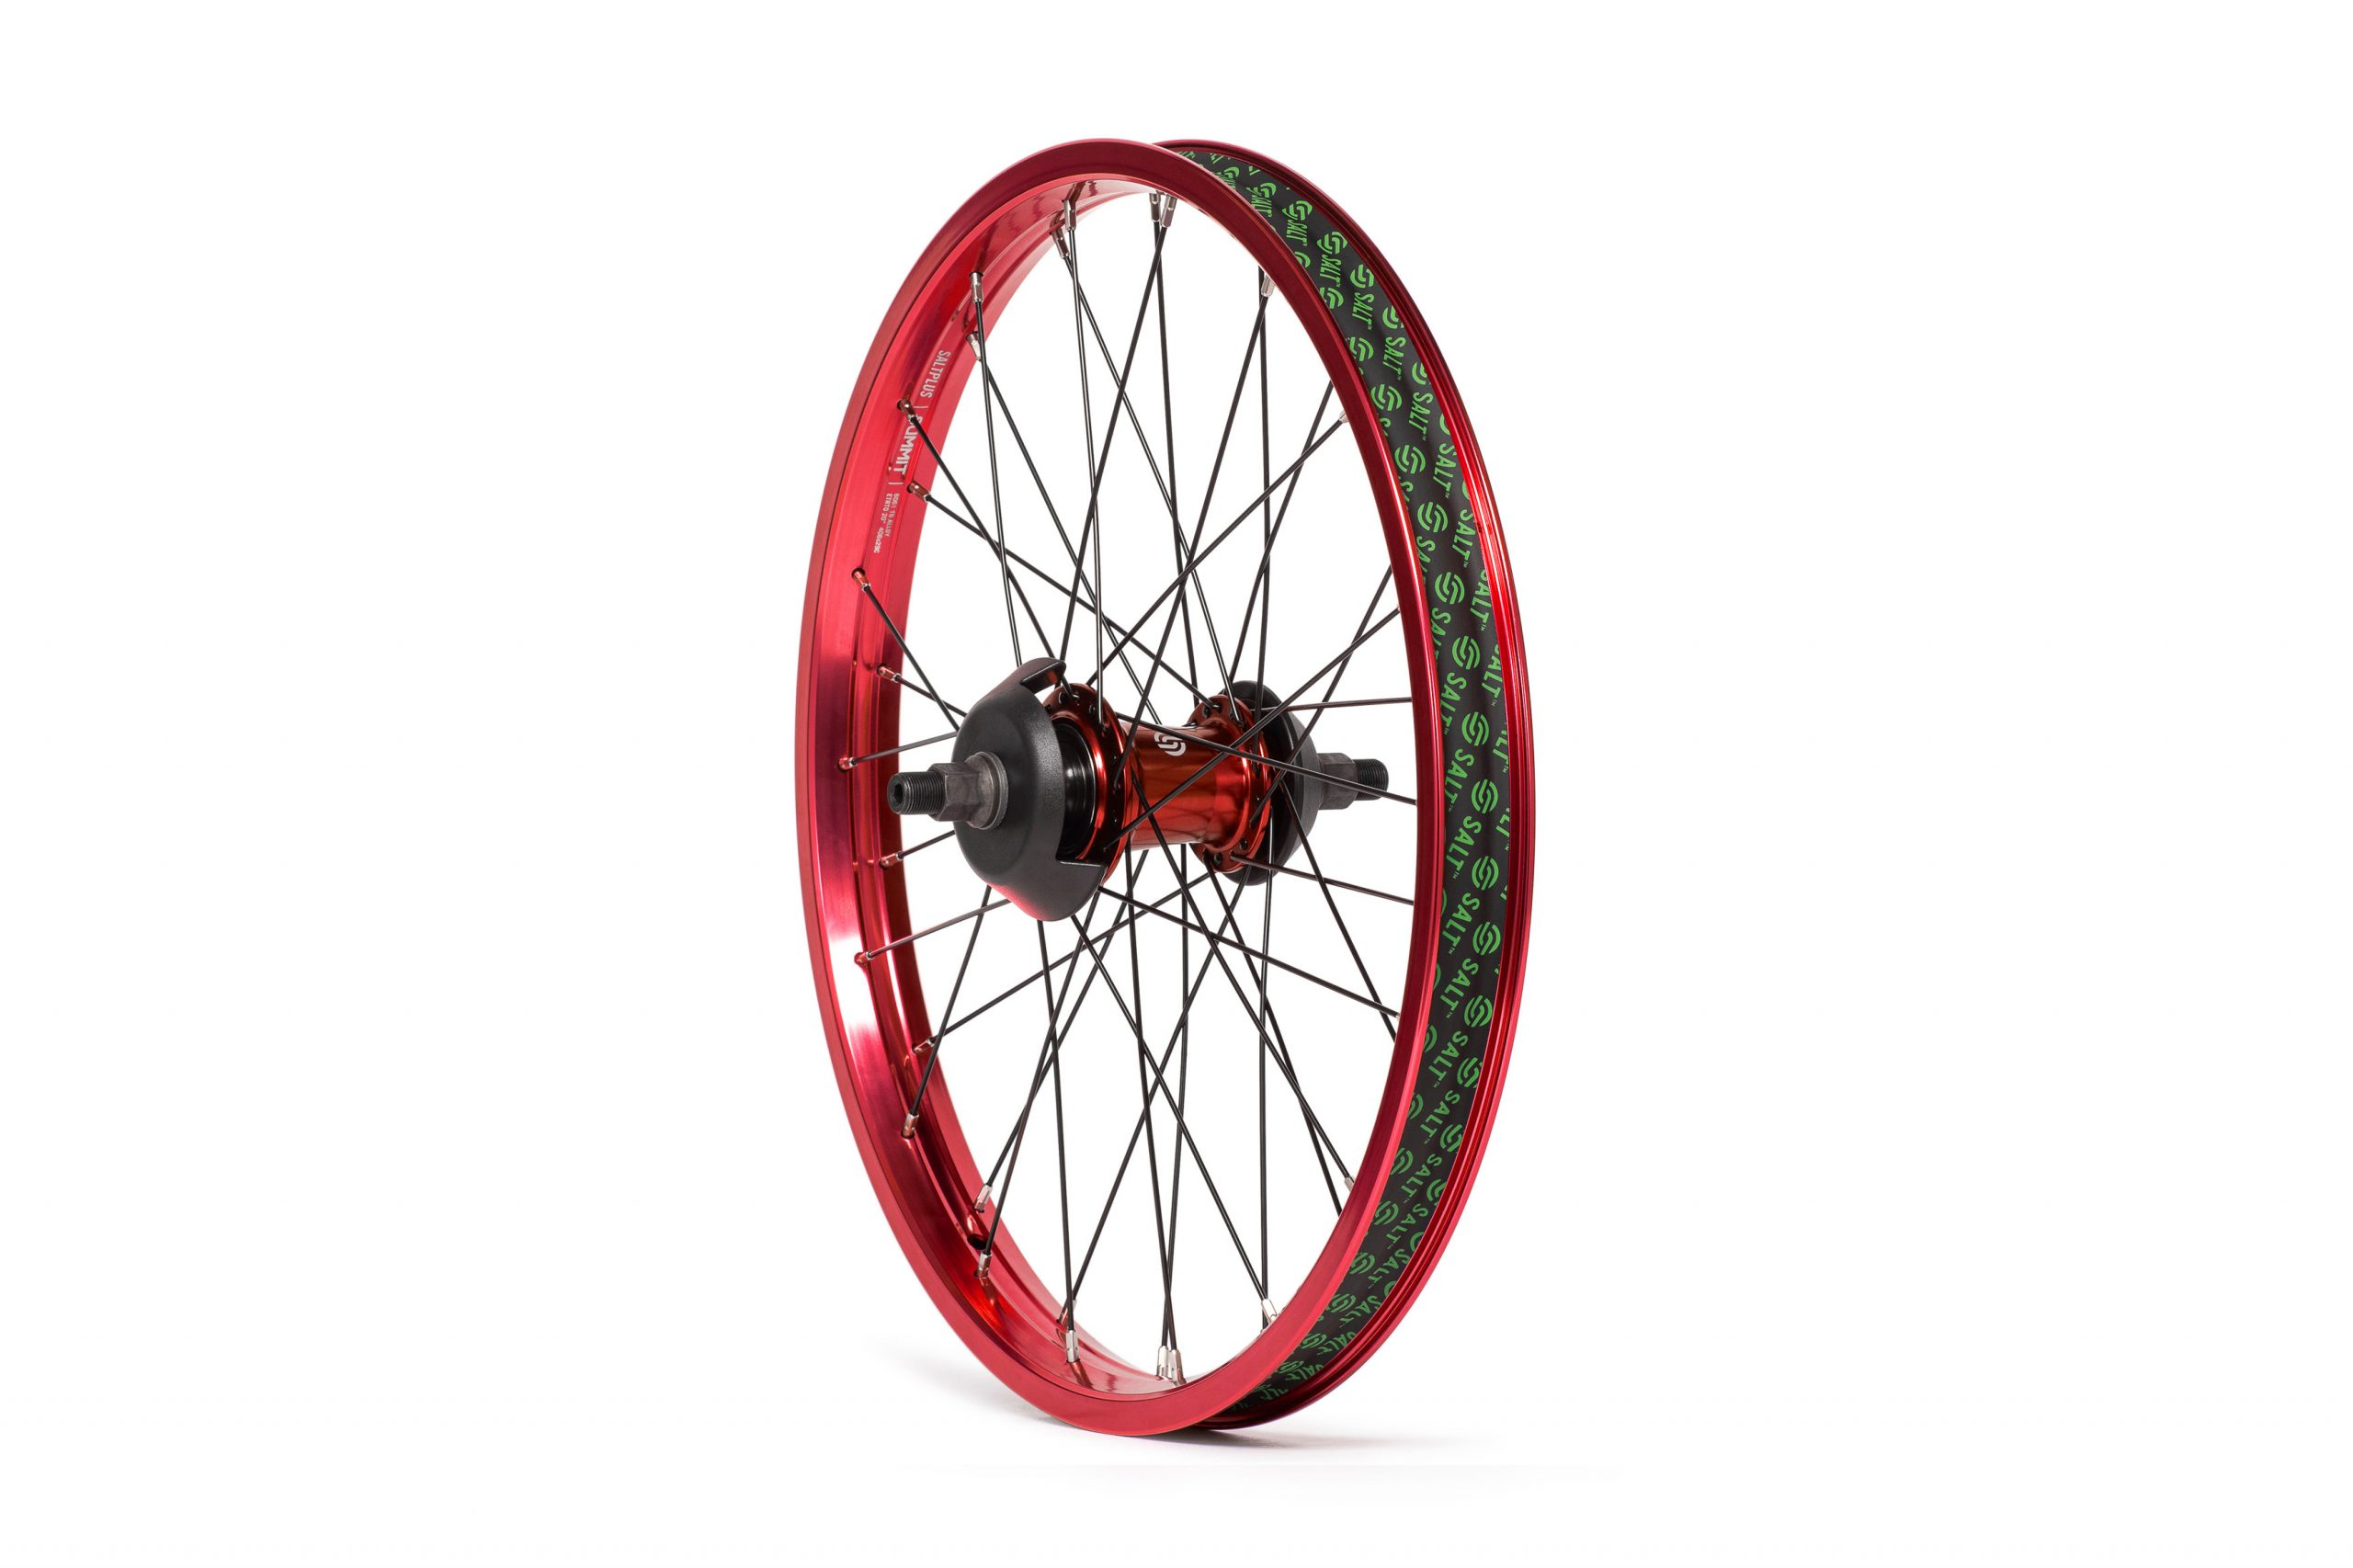 Salt_Everest_FC_rear_wheel_red_02